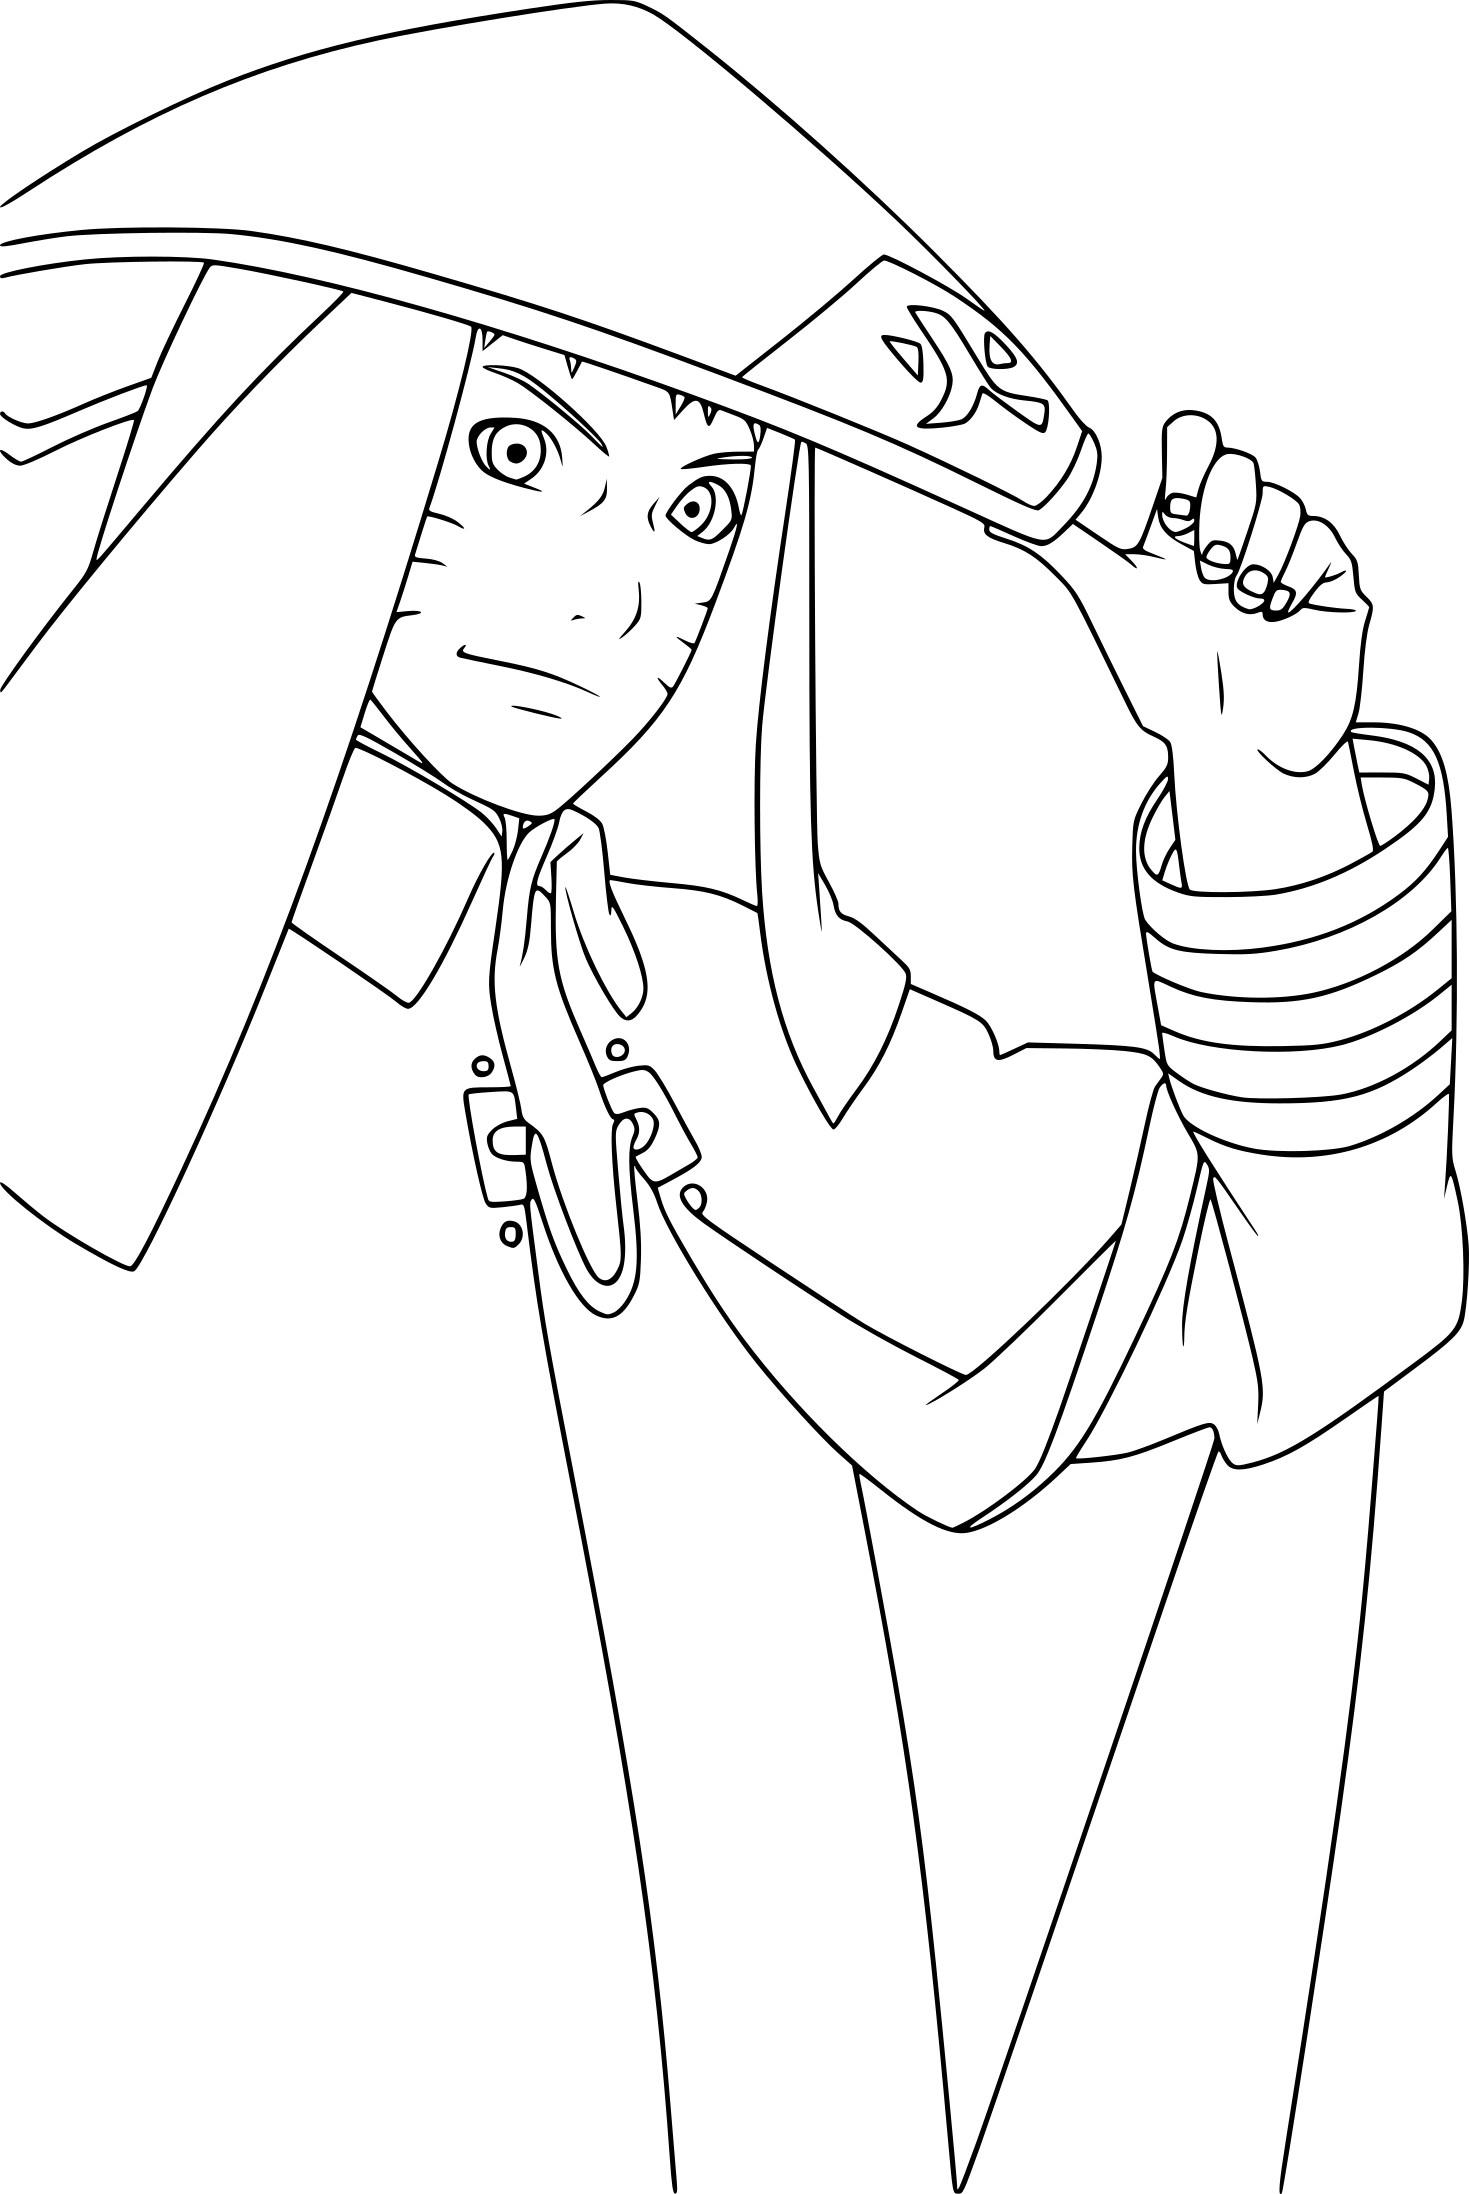 Coloriage De Naruto Hokage À Imprimer Sur Coloriage De serapportantà Dessin De Naruto